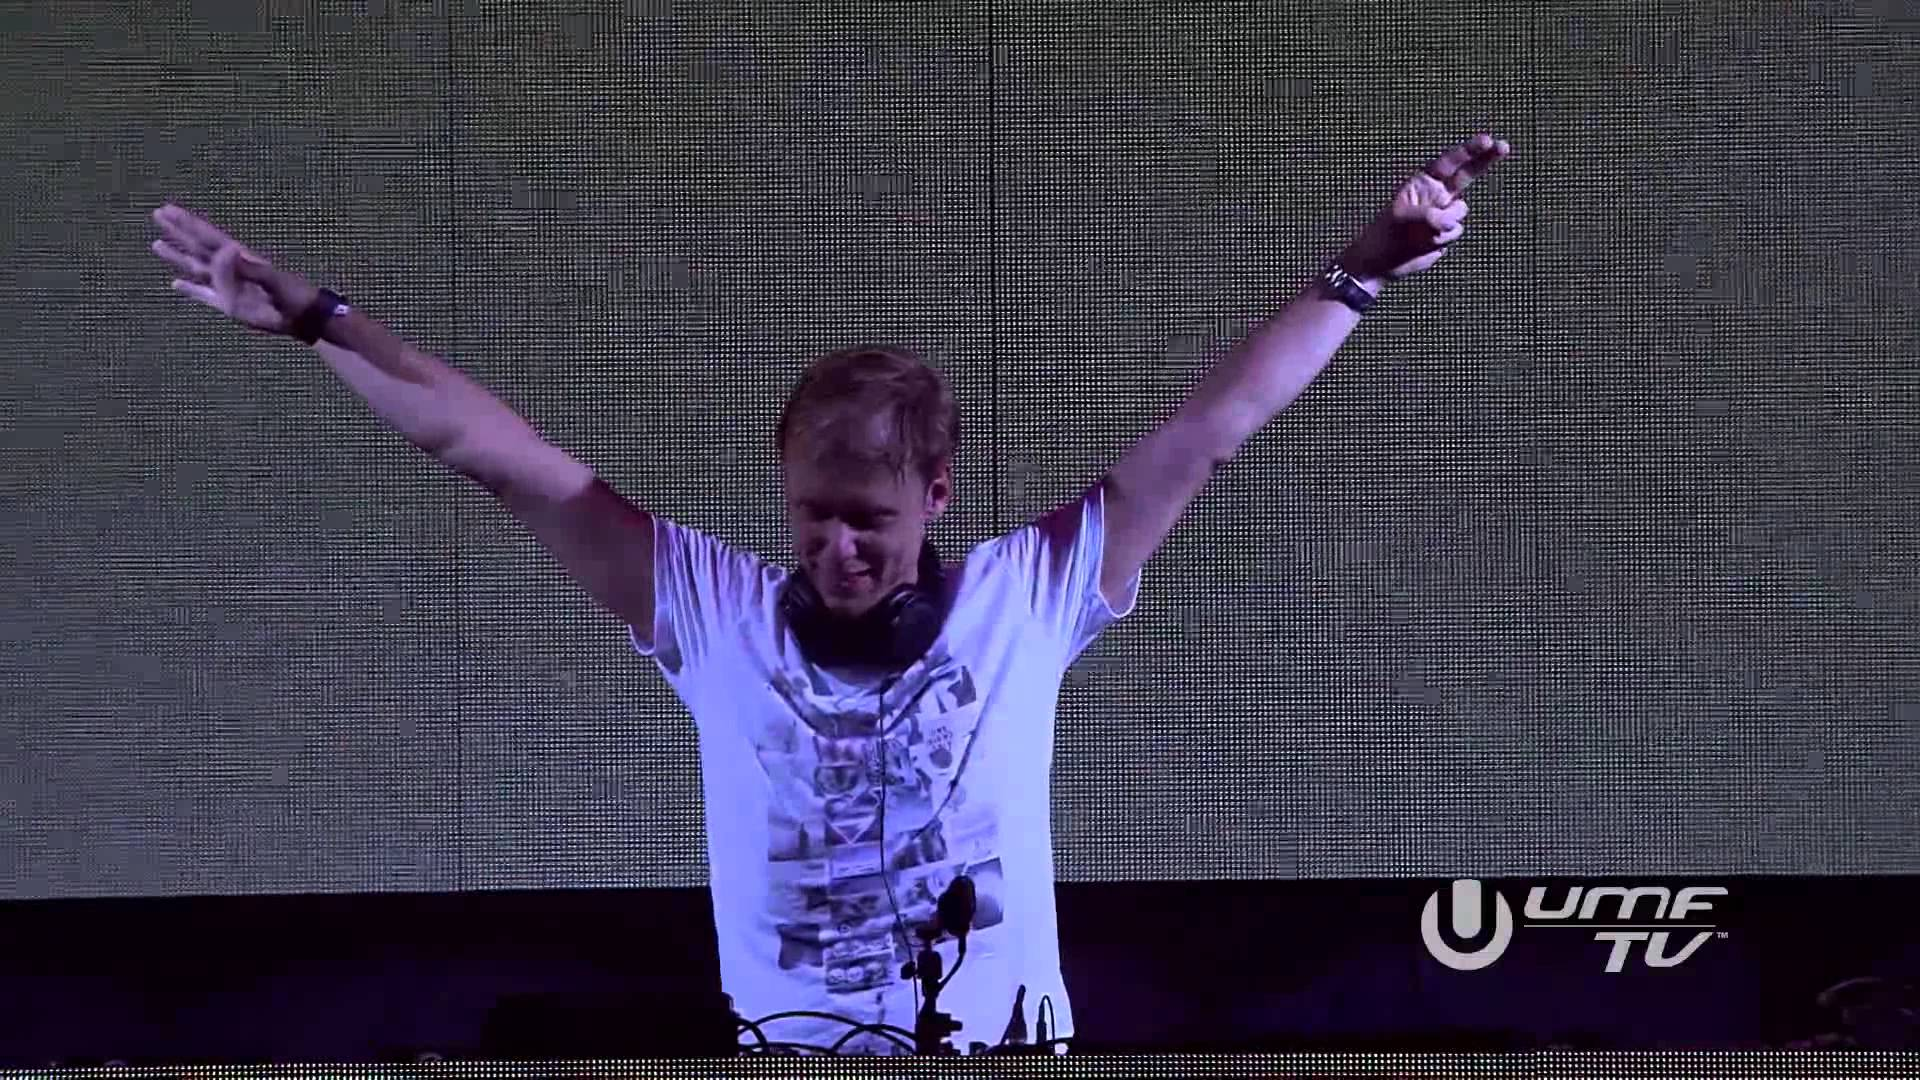 Armin ultra